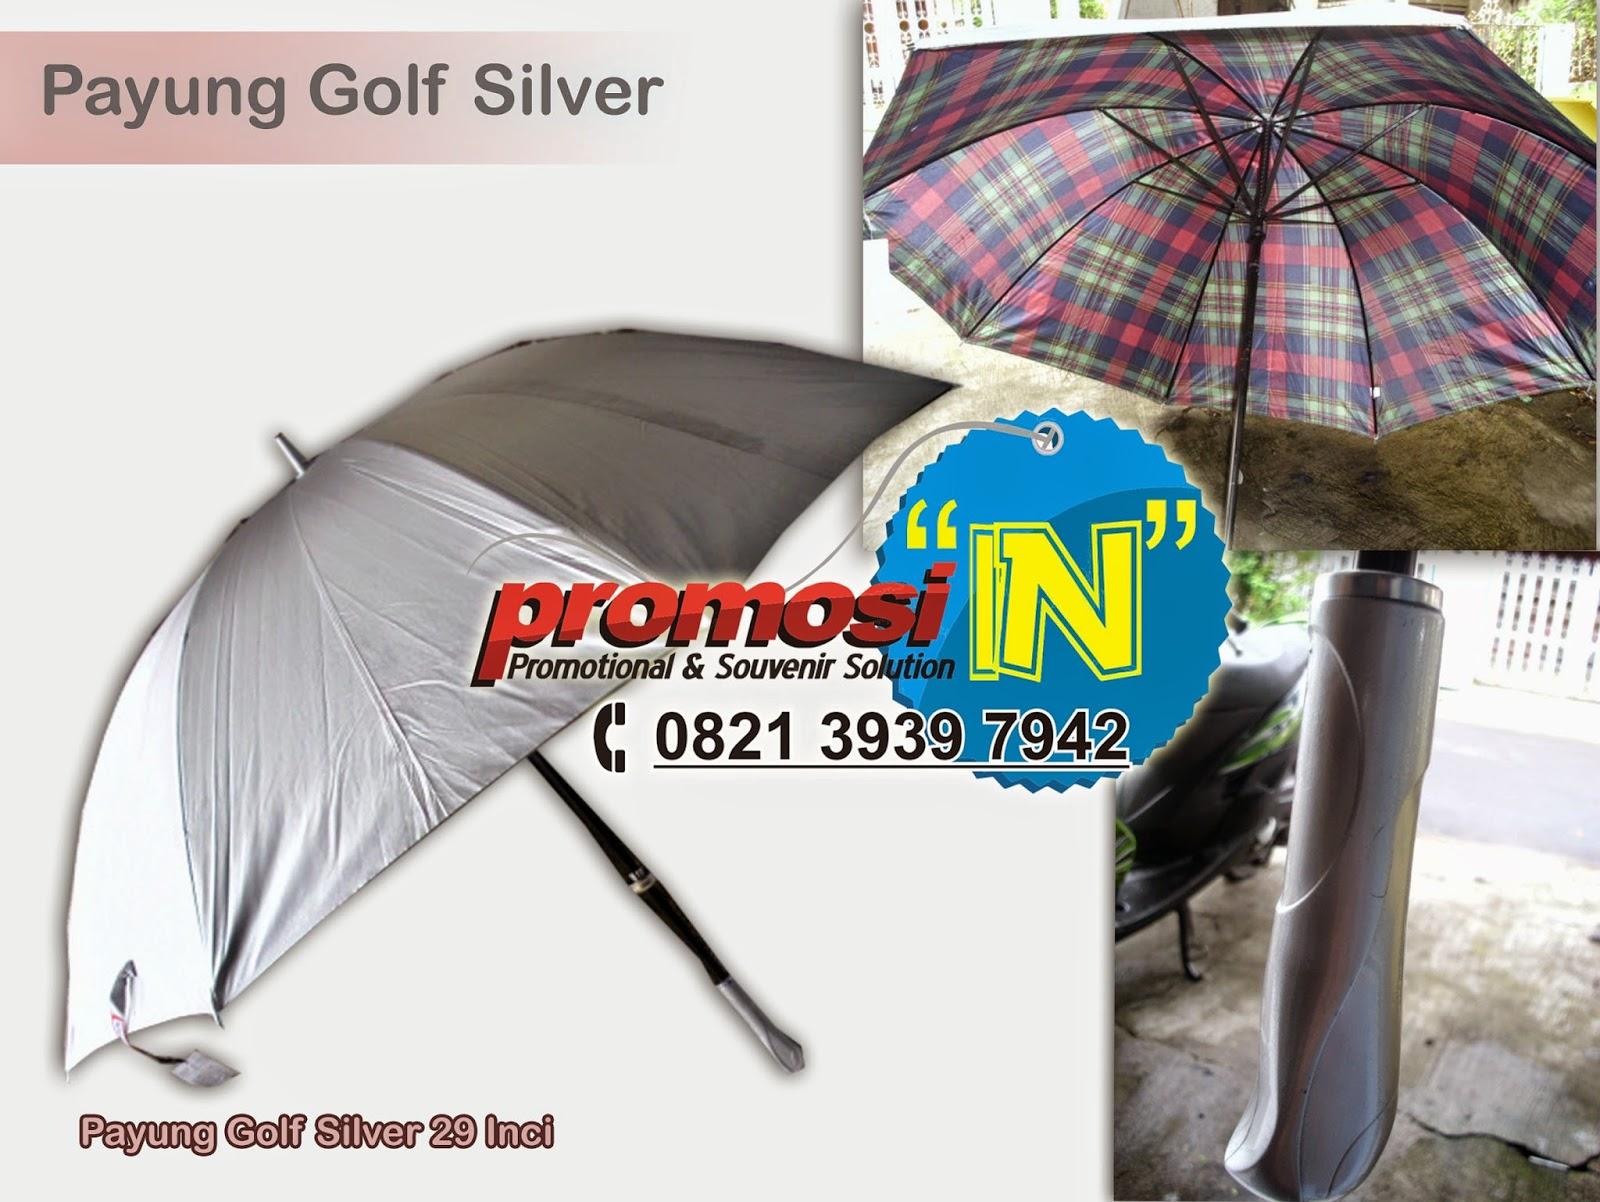 Payung, Payung Promosi Murah, Jual Payung Promosi, Payung Souvenir, Payung Sablon, Payung Press